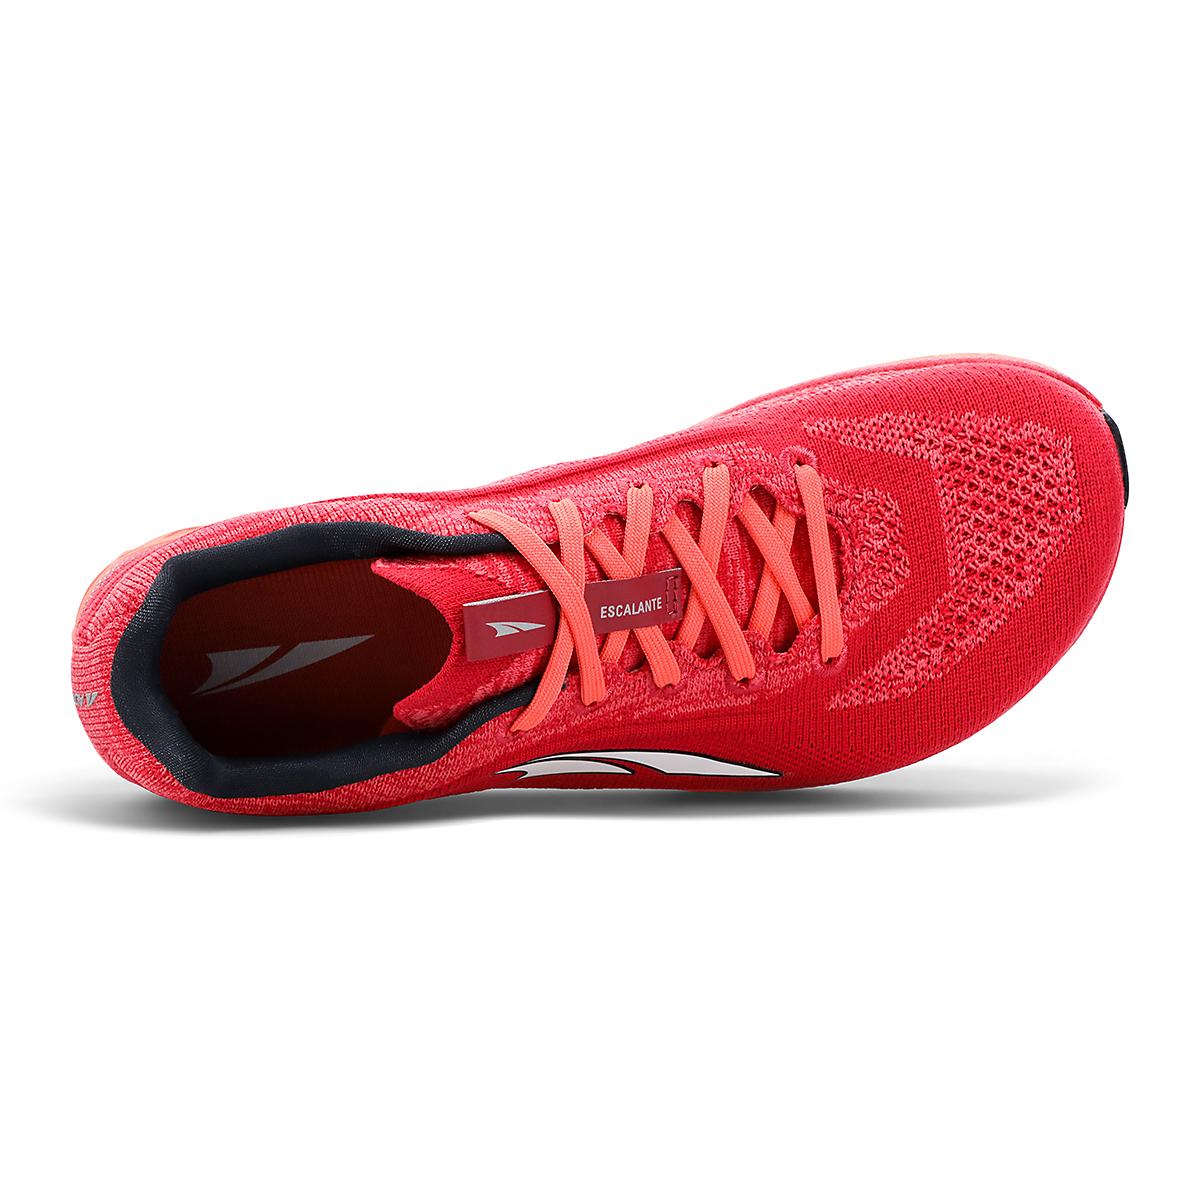 Women's Altra Escalante 2.5 Running Shoe - Color: Raspberry - Size: 5.5 - Width: Regular, Raspberry, large, image 3